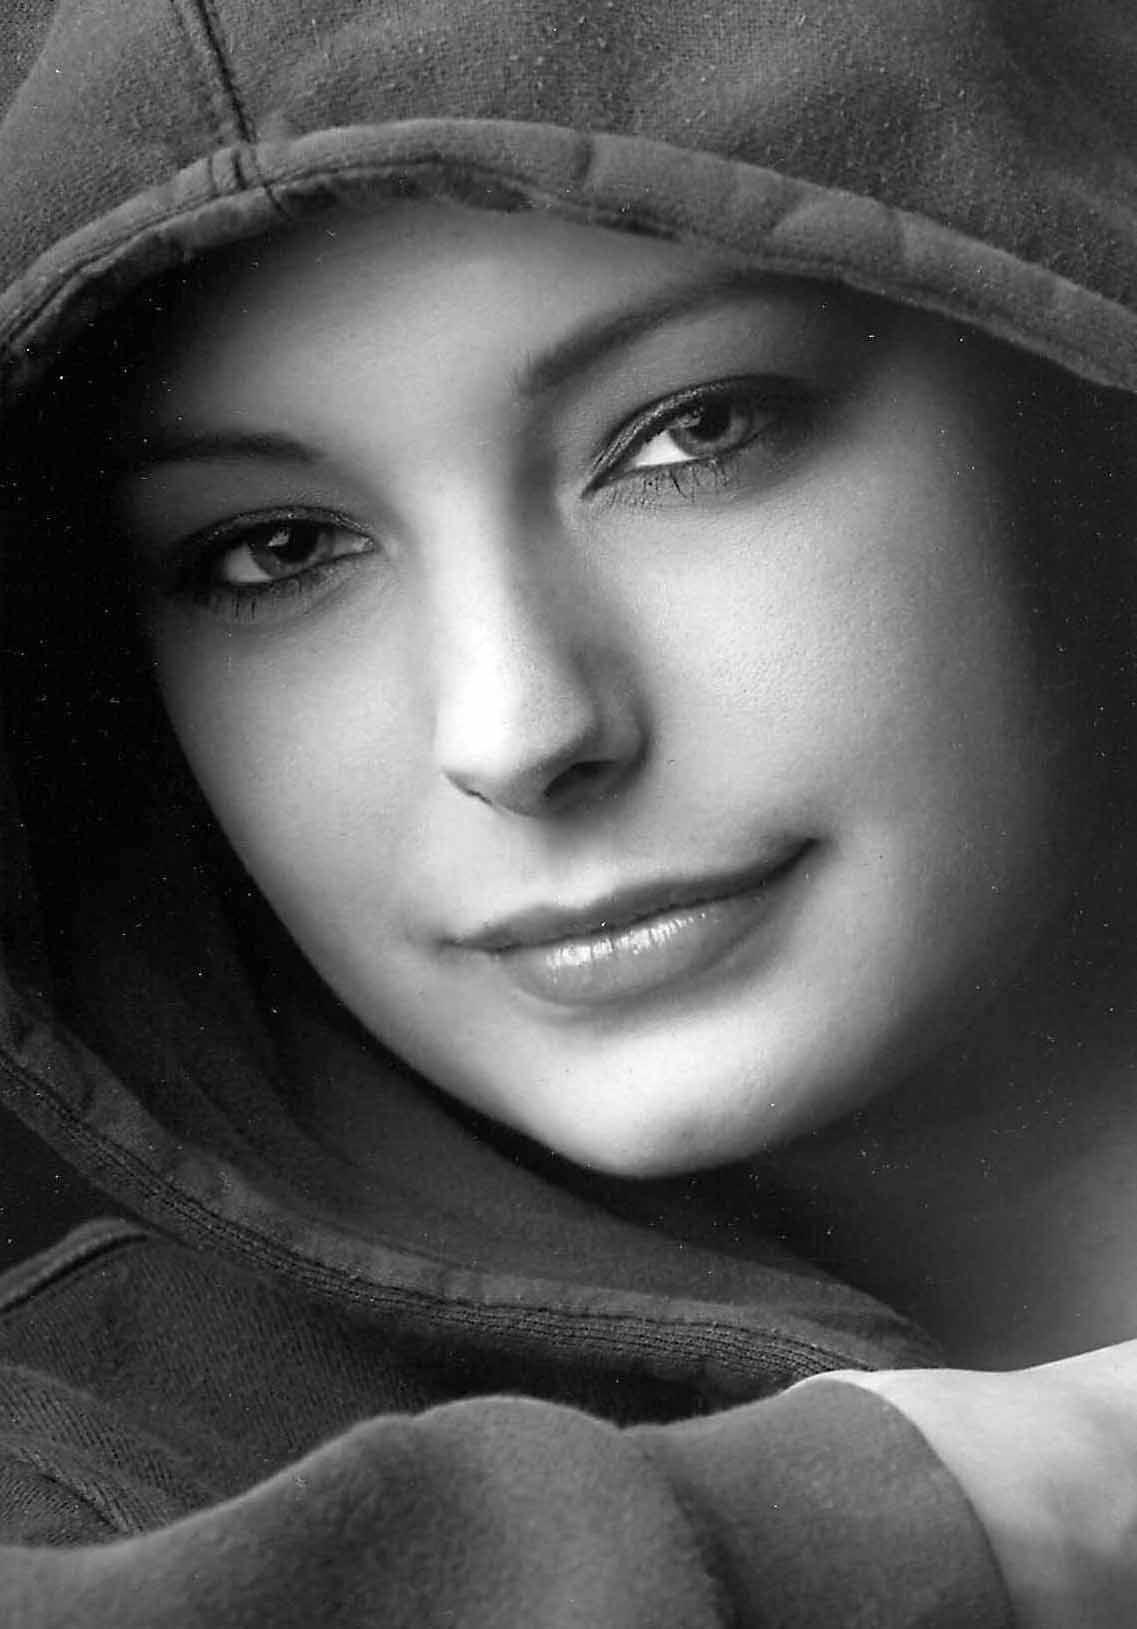 Dana Pharo, 28, formerly of Mauston